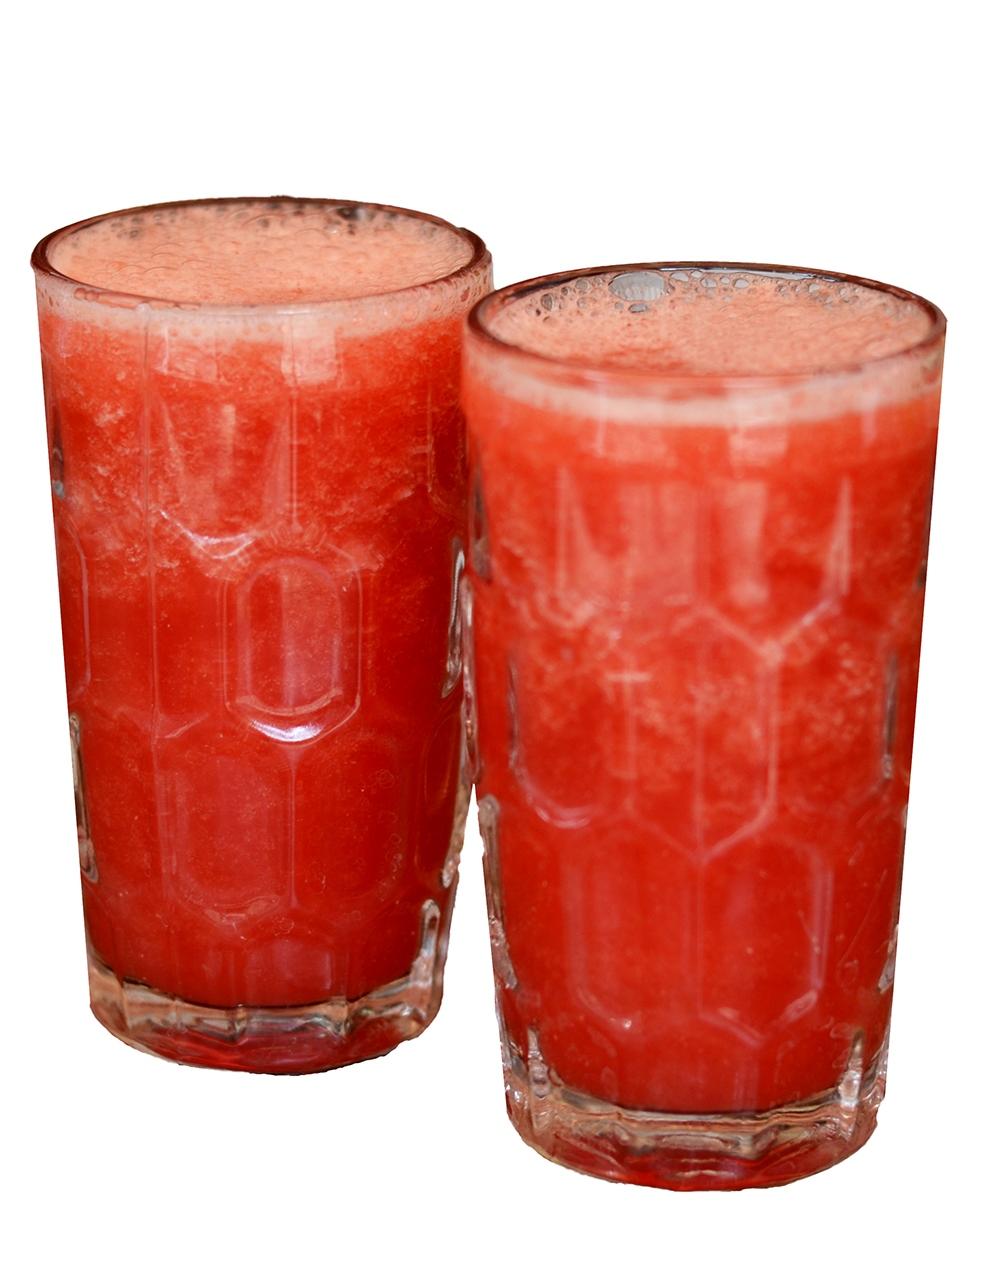 File:Watermelon Juice.jpg - Wikipedia, the free encyclopedia